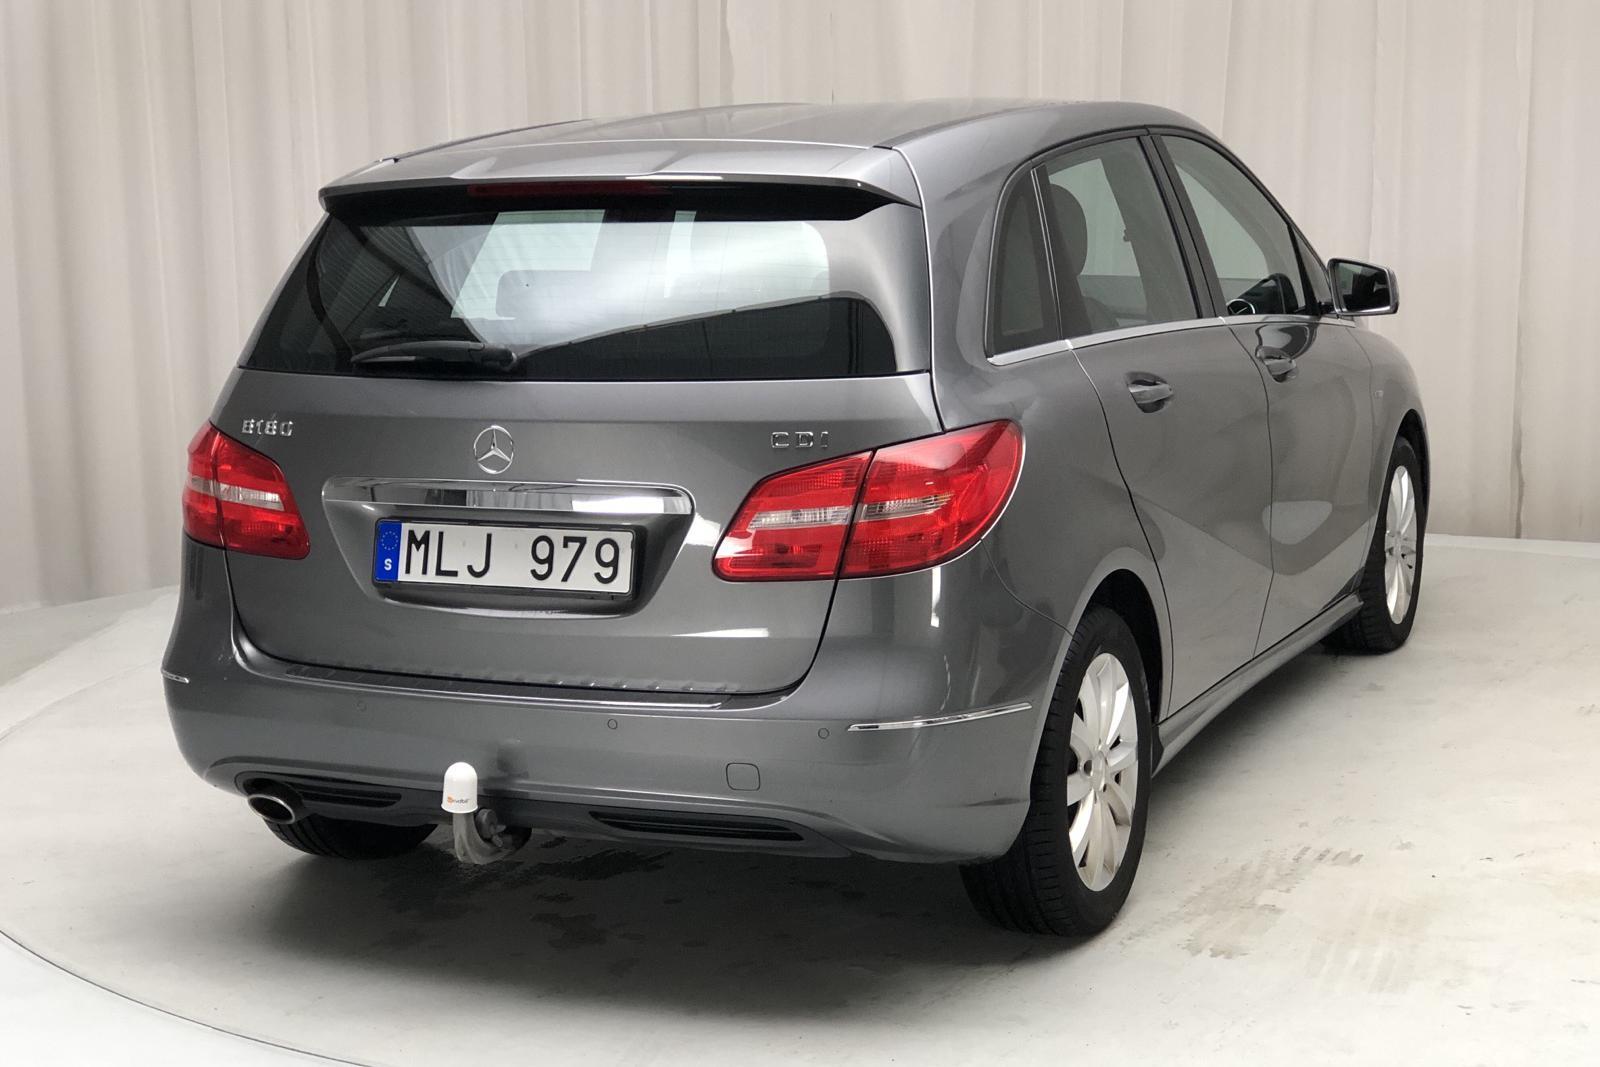 Mercedes B 180 CDI W246 (109hk) - 86 000 km - Dark Grey - 2012